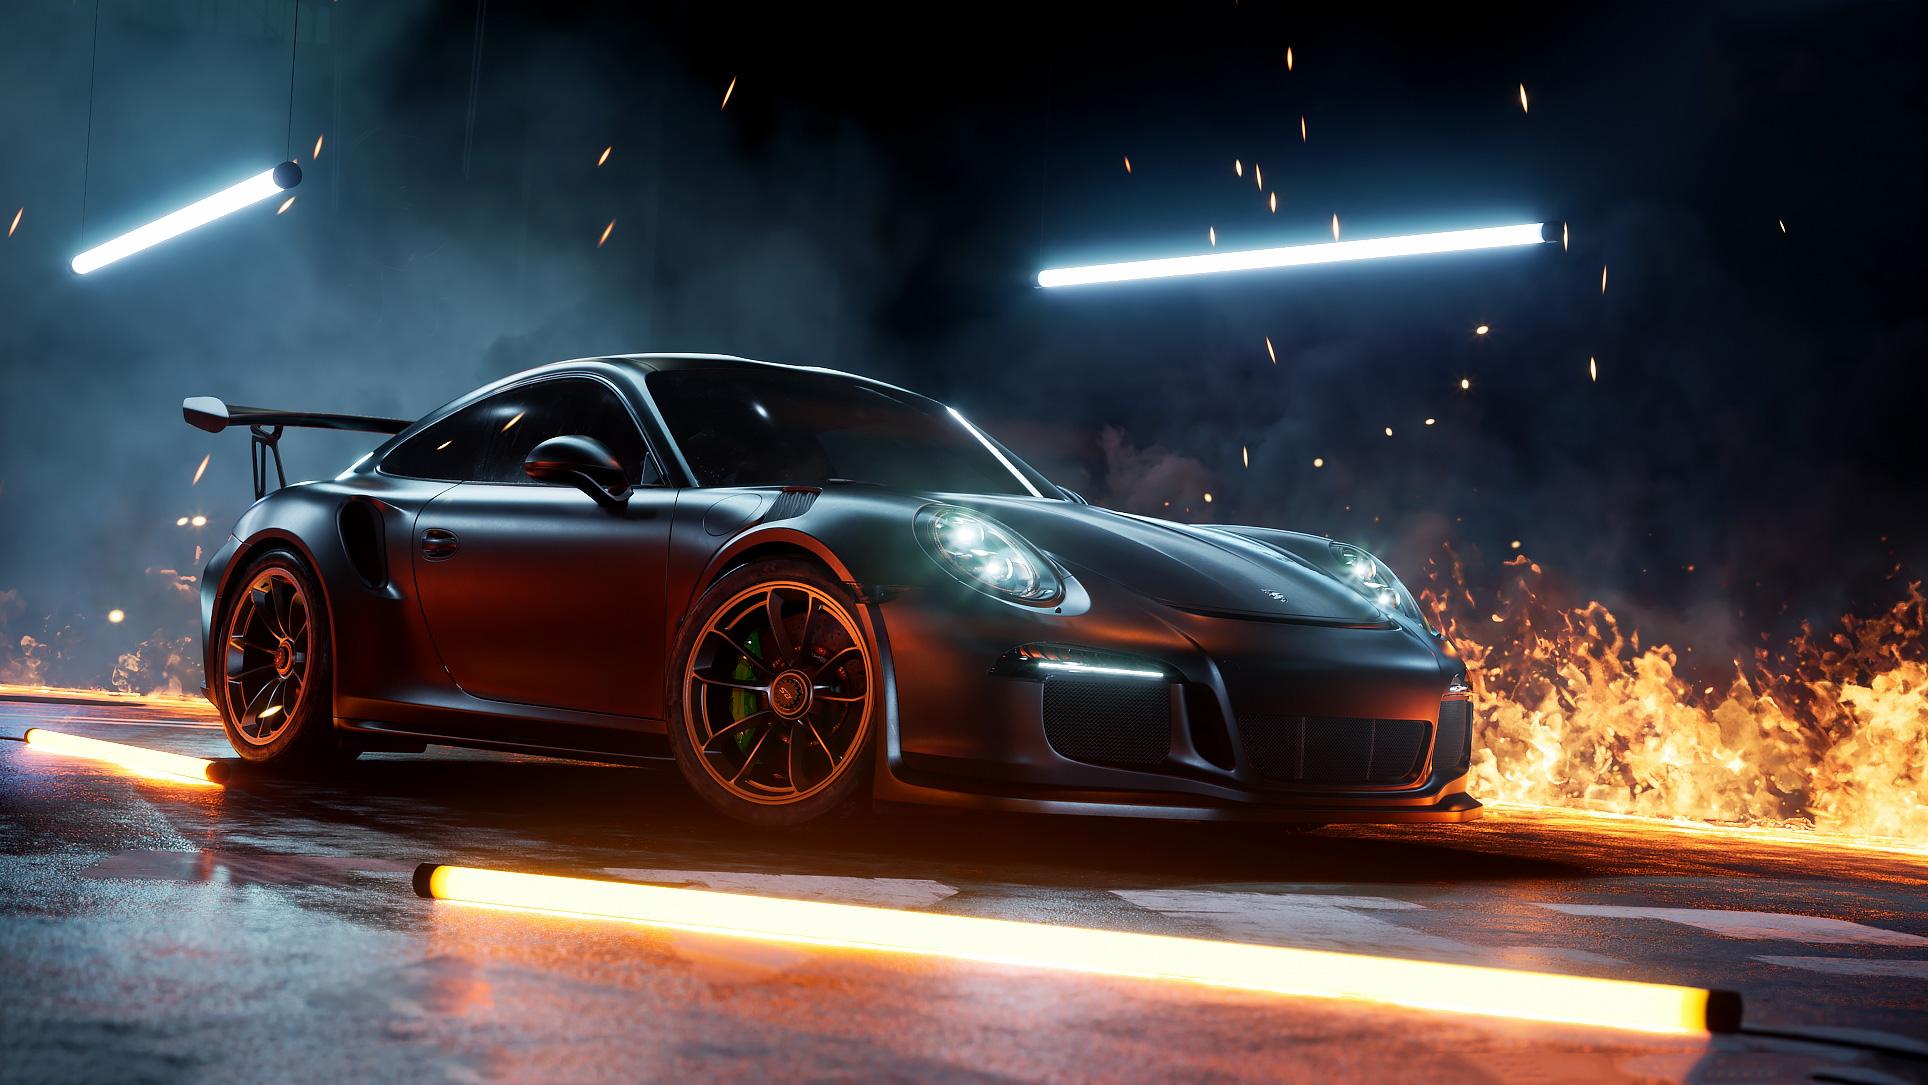 Porsche 911 Sport Car, HD Cars, 4k Wallpapers, Images ...